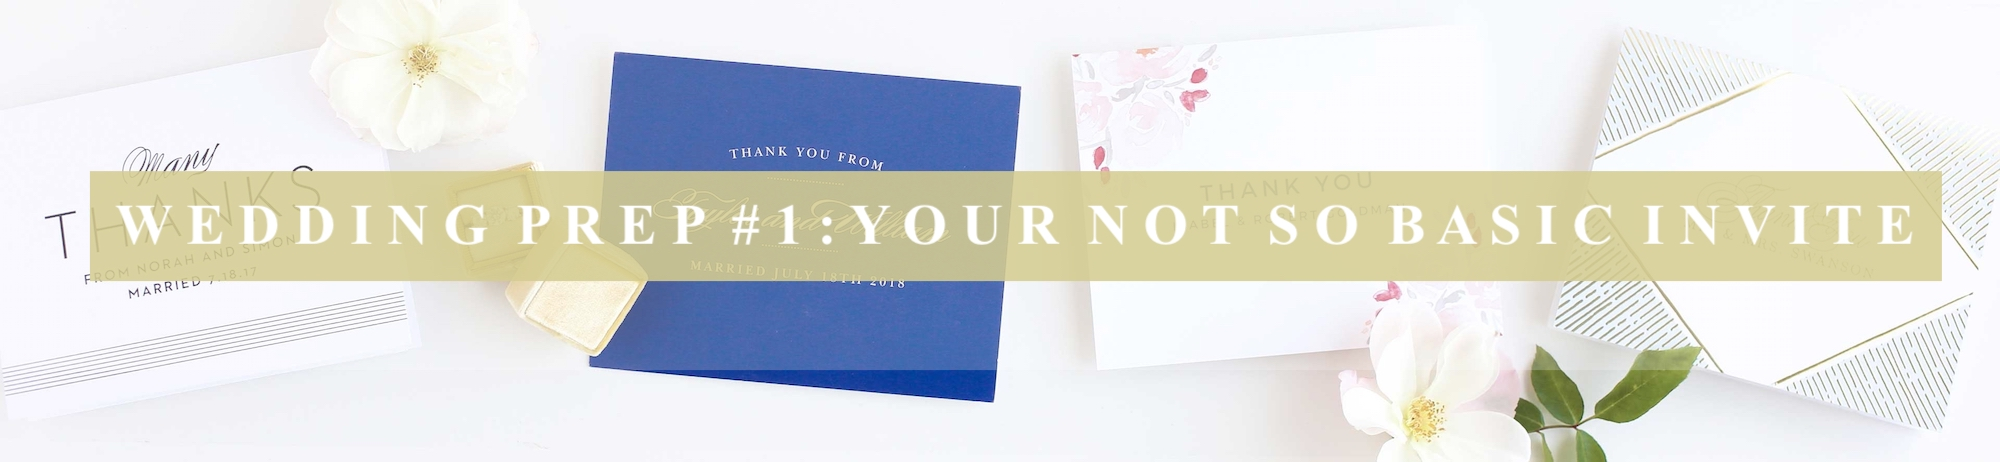 Wedding Prep #1: Your Not So Basic Invite